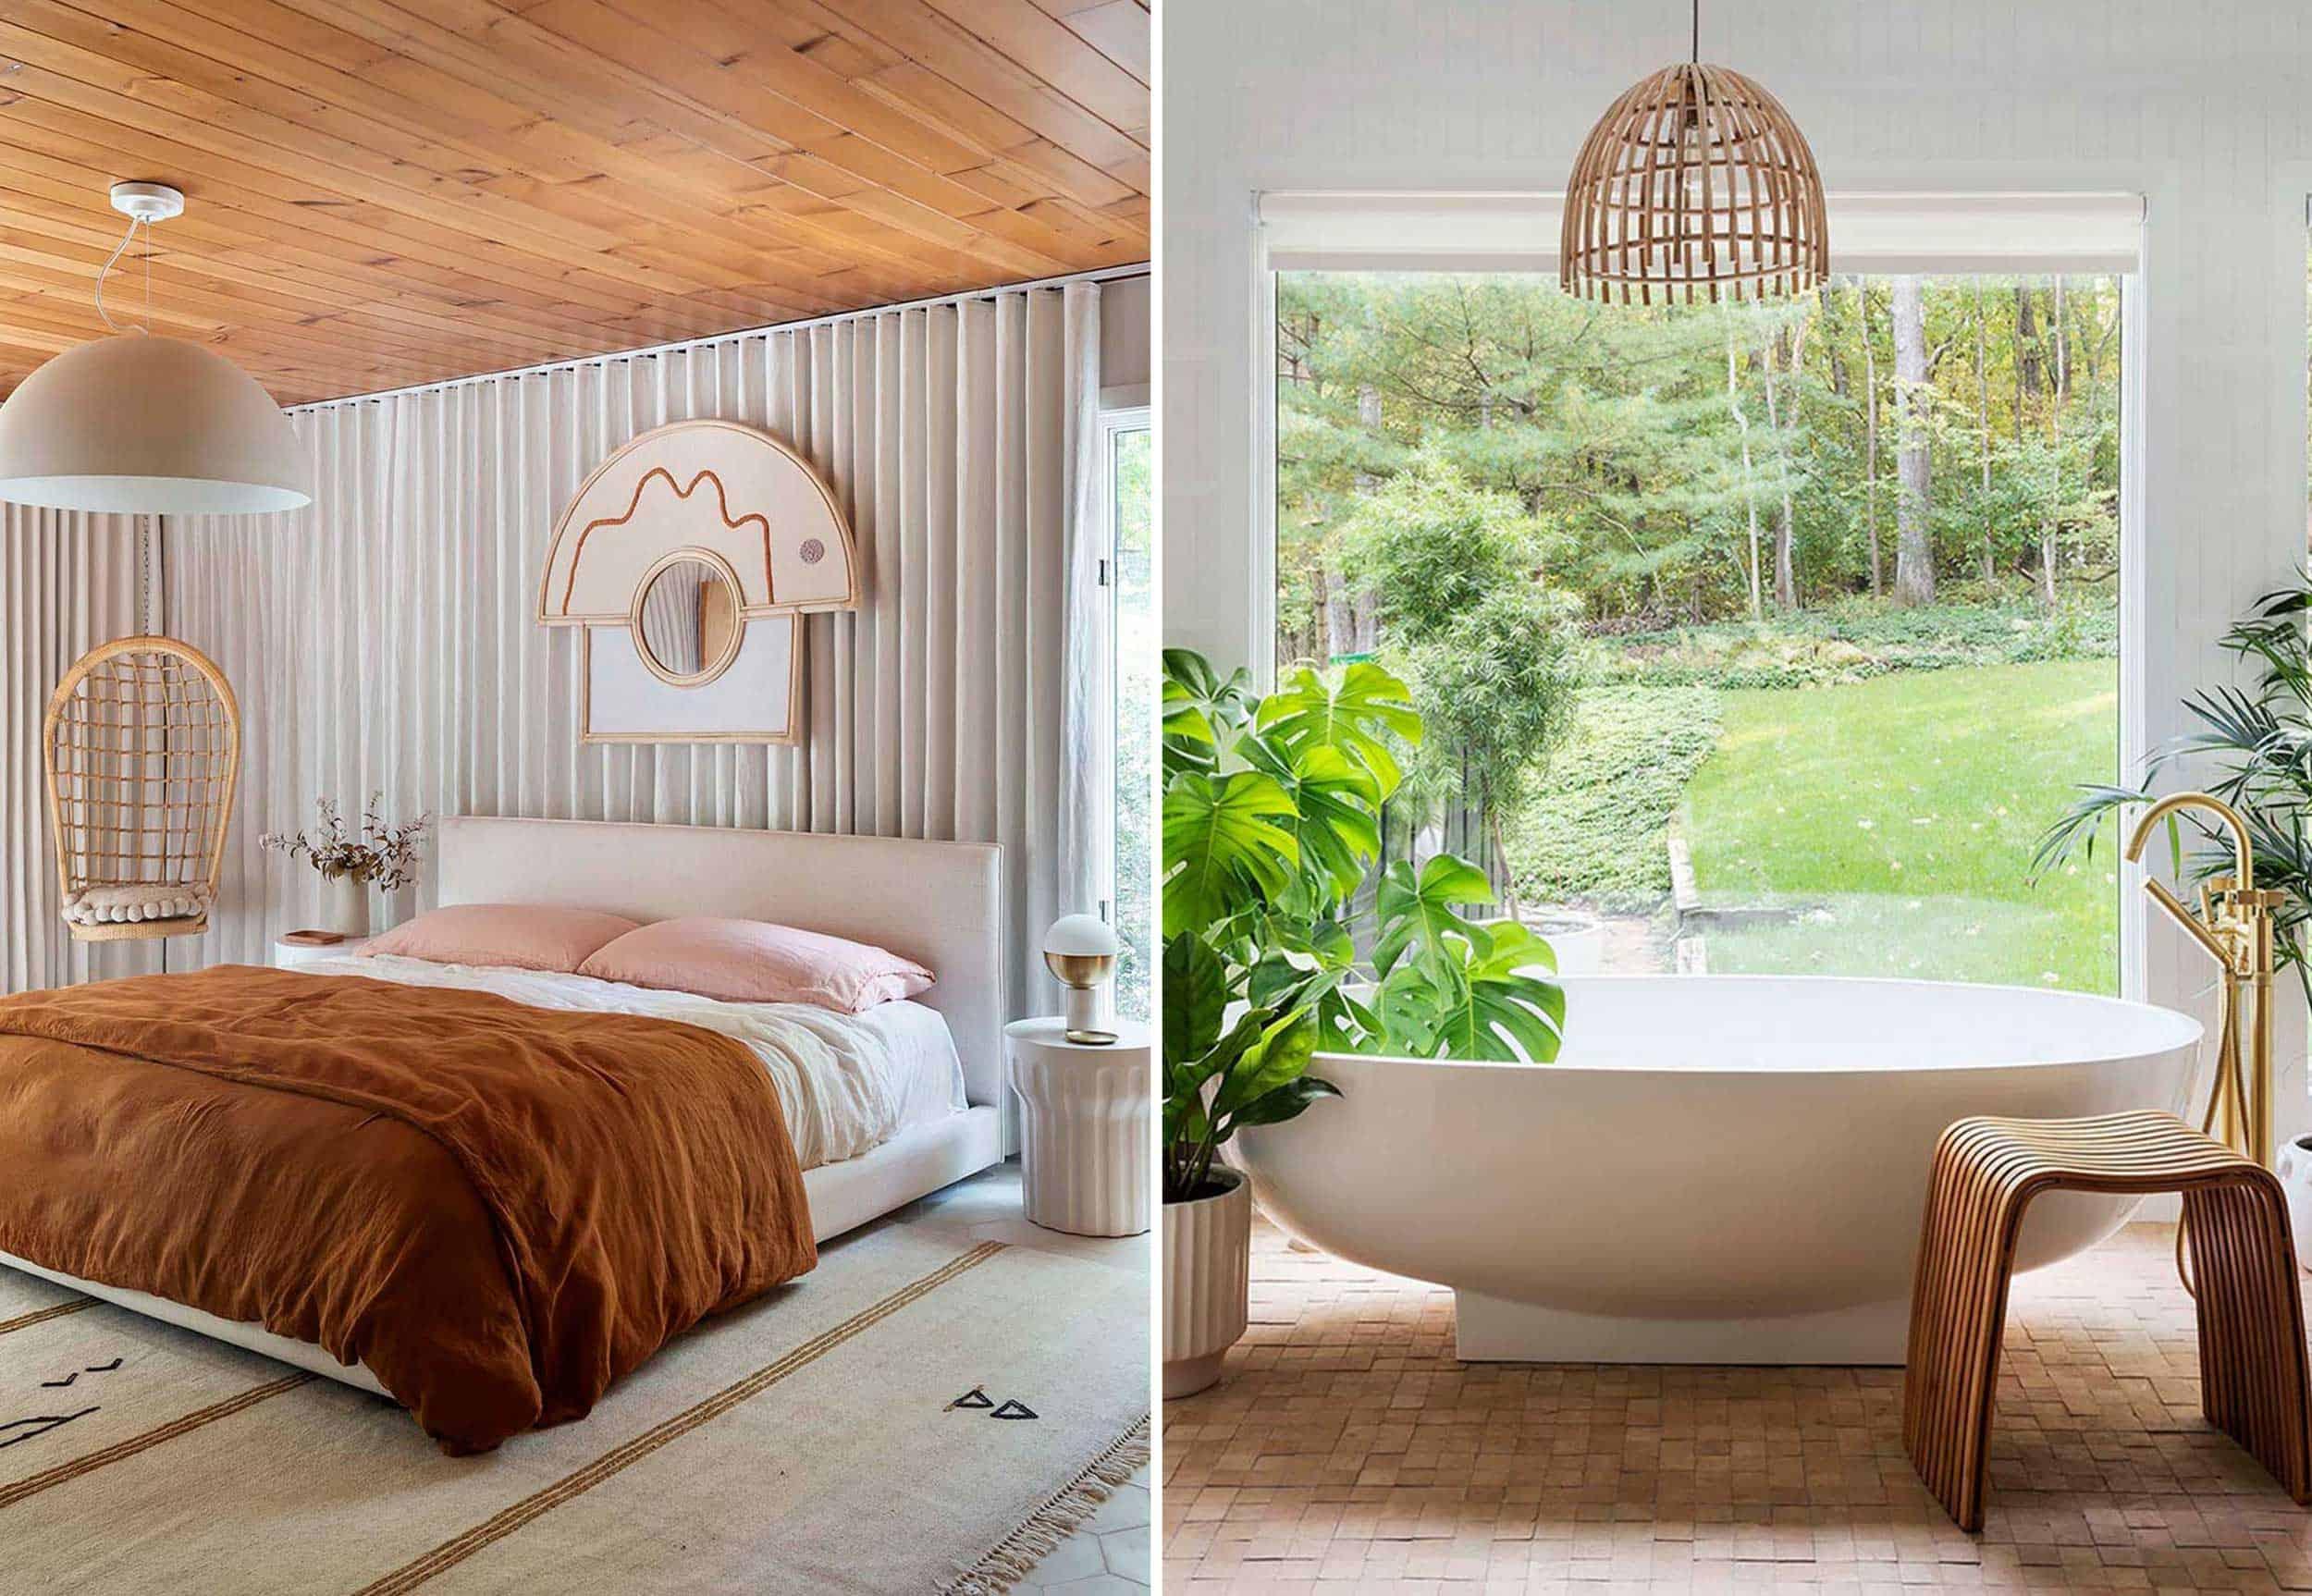 Sss Side By Side Bed Bath